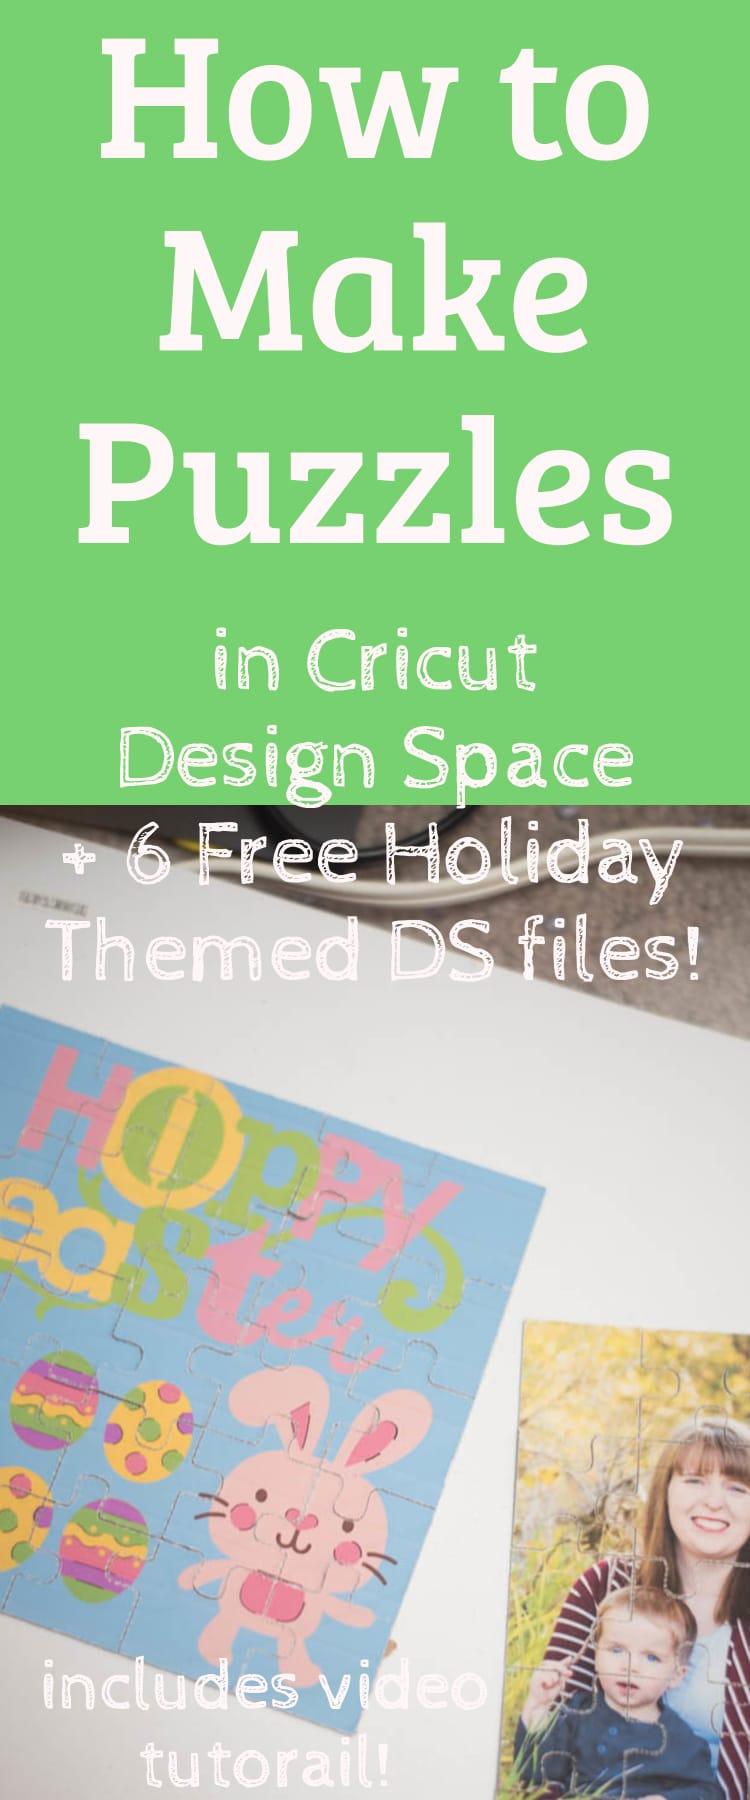 cricut maker / cricut design space / cricut project / upcycling / upcycle craft / cricut explore air / #cricutmaker #cricutexploreair #upcycle via @clarkscondensed